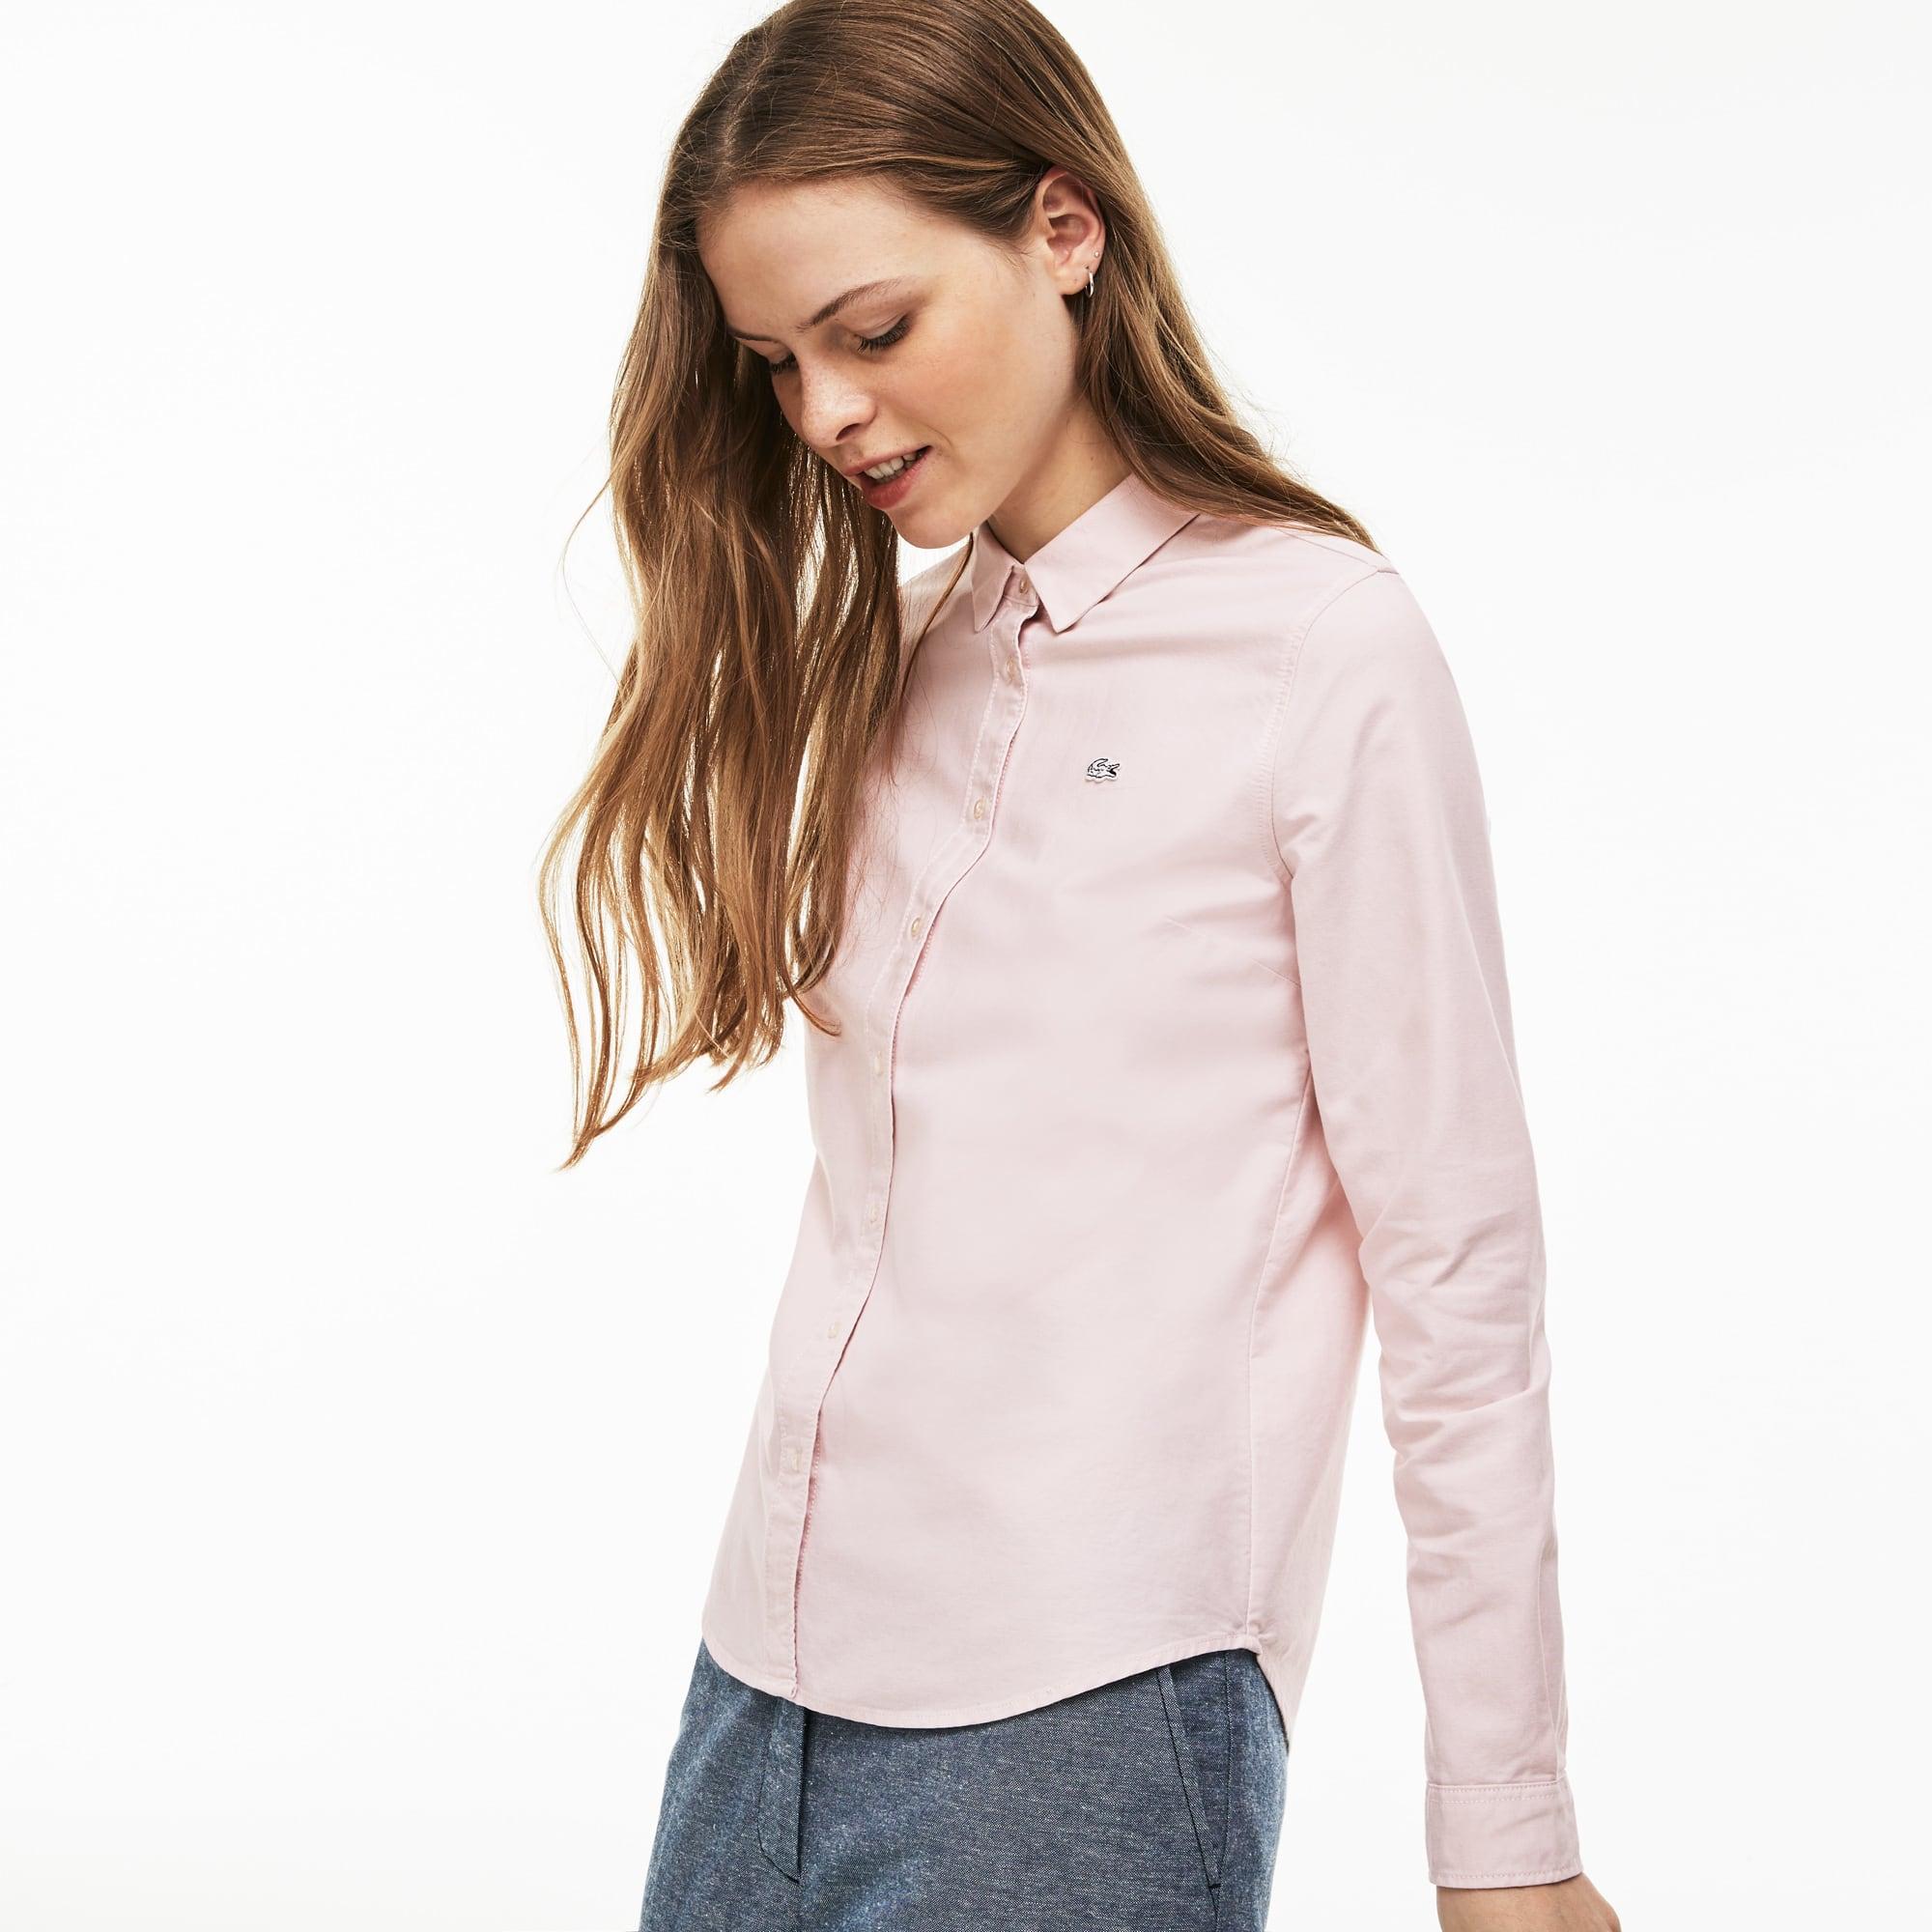 Lacoste LIVE-shirt dames slim fit Oxfordkatoen